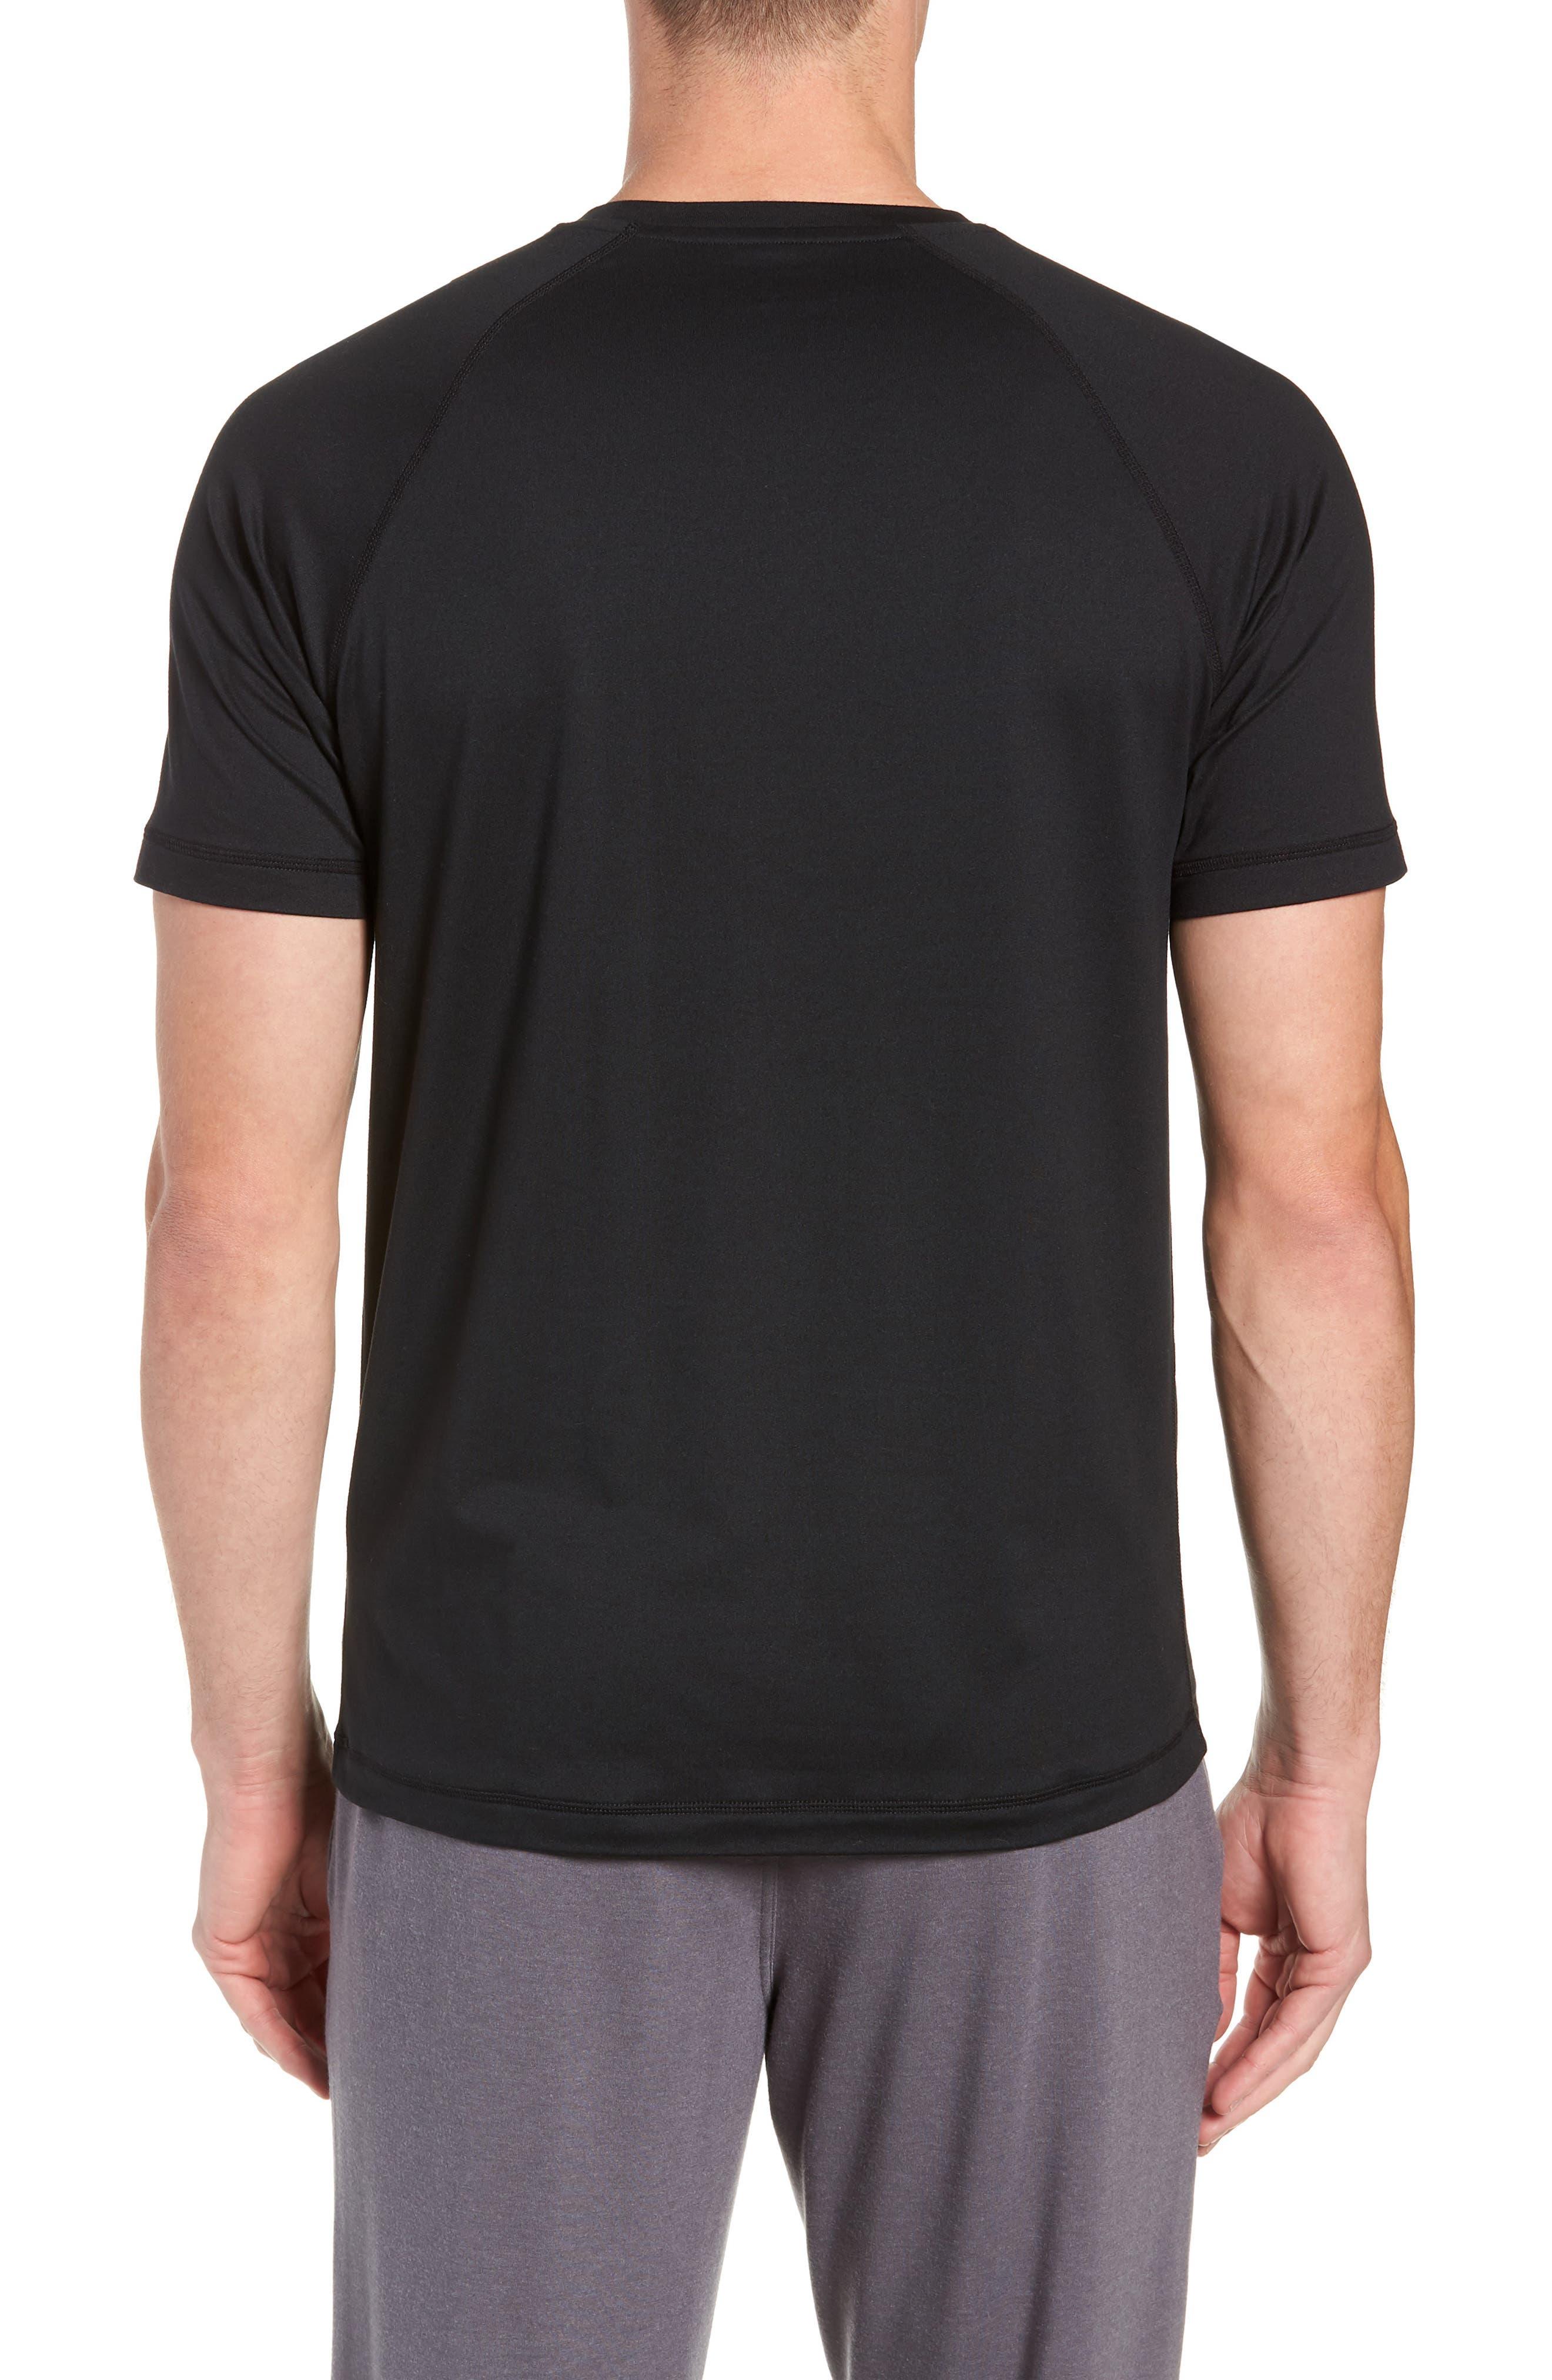 Reign Performance T-Shirt,                             Alternate thumbnail 2, color,                             BLACK